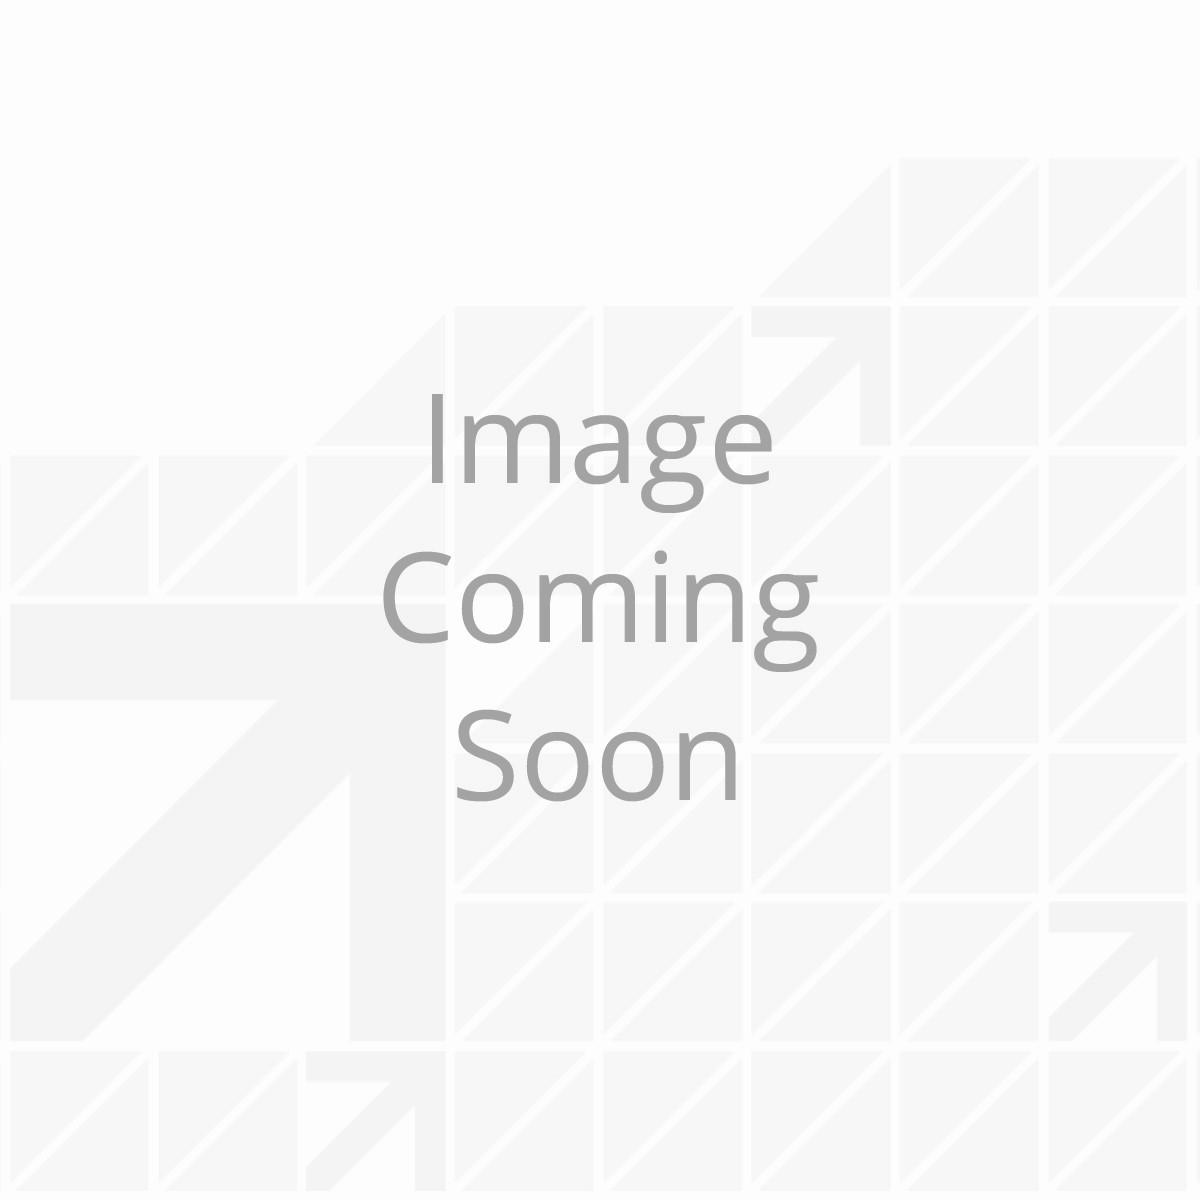 16' Destination Awning Roller Assembly - Solid Black (Black Shield)